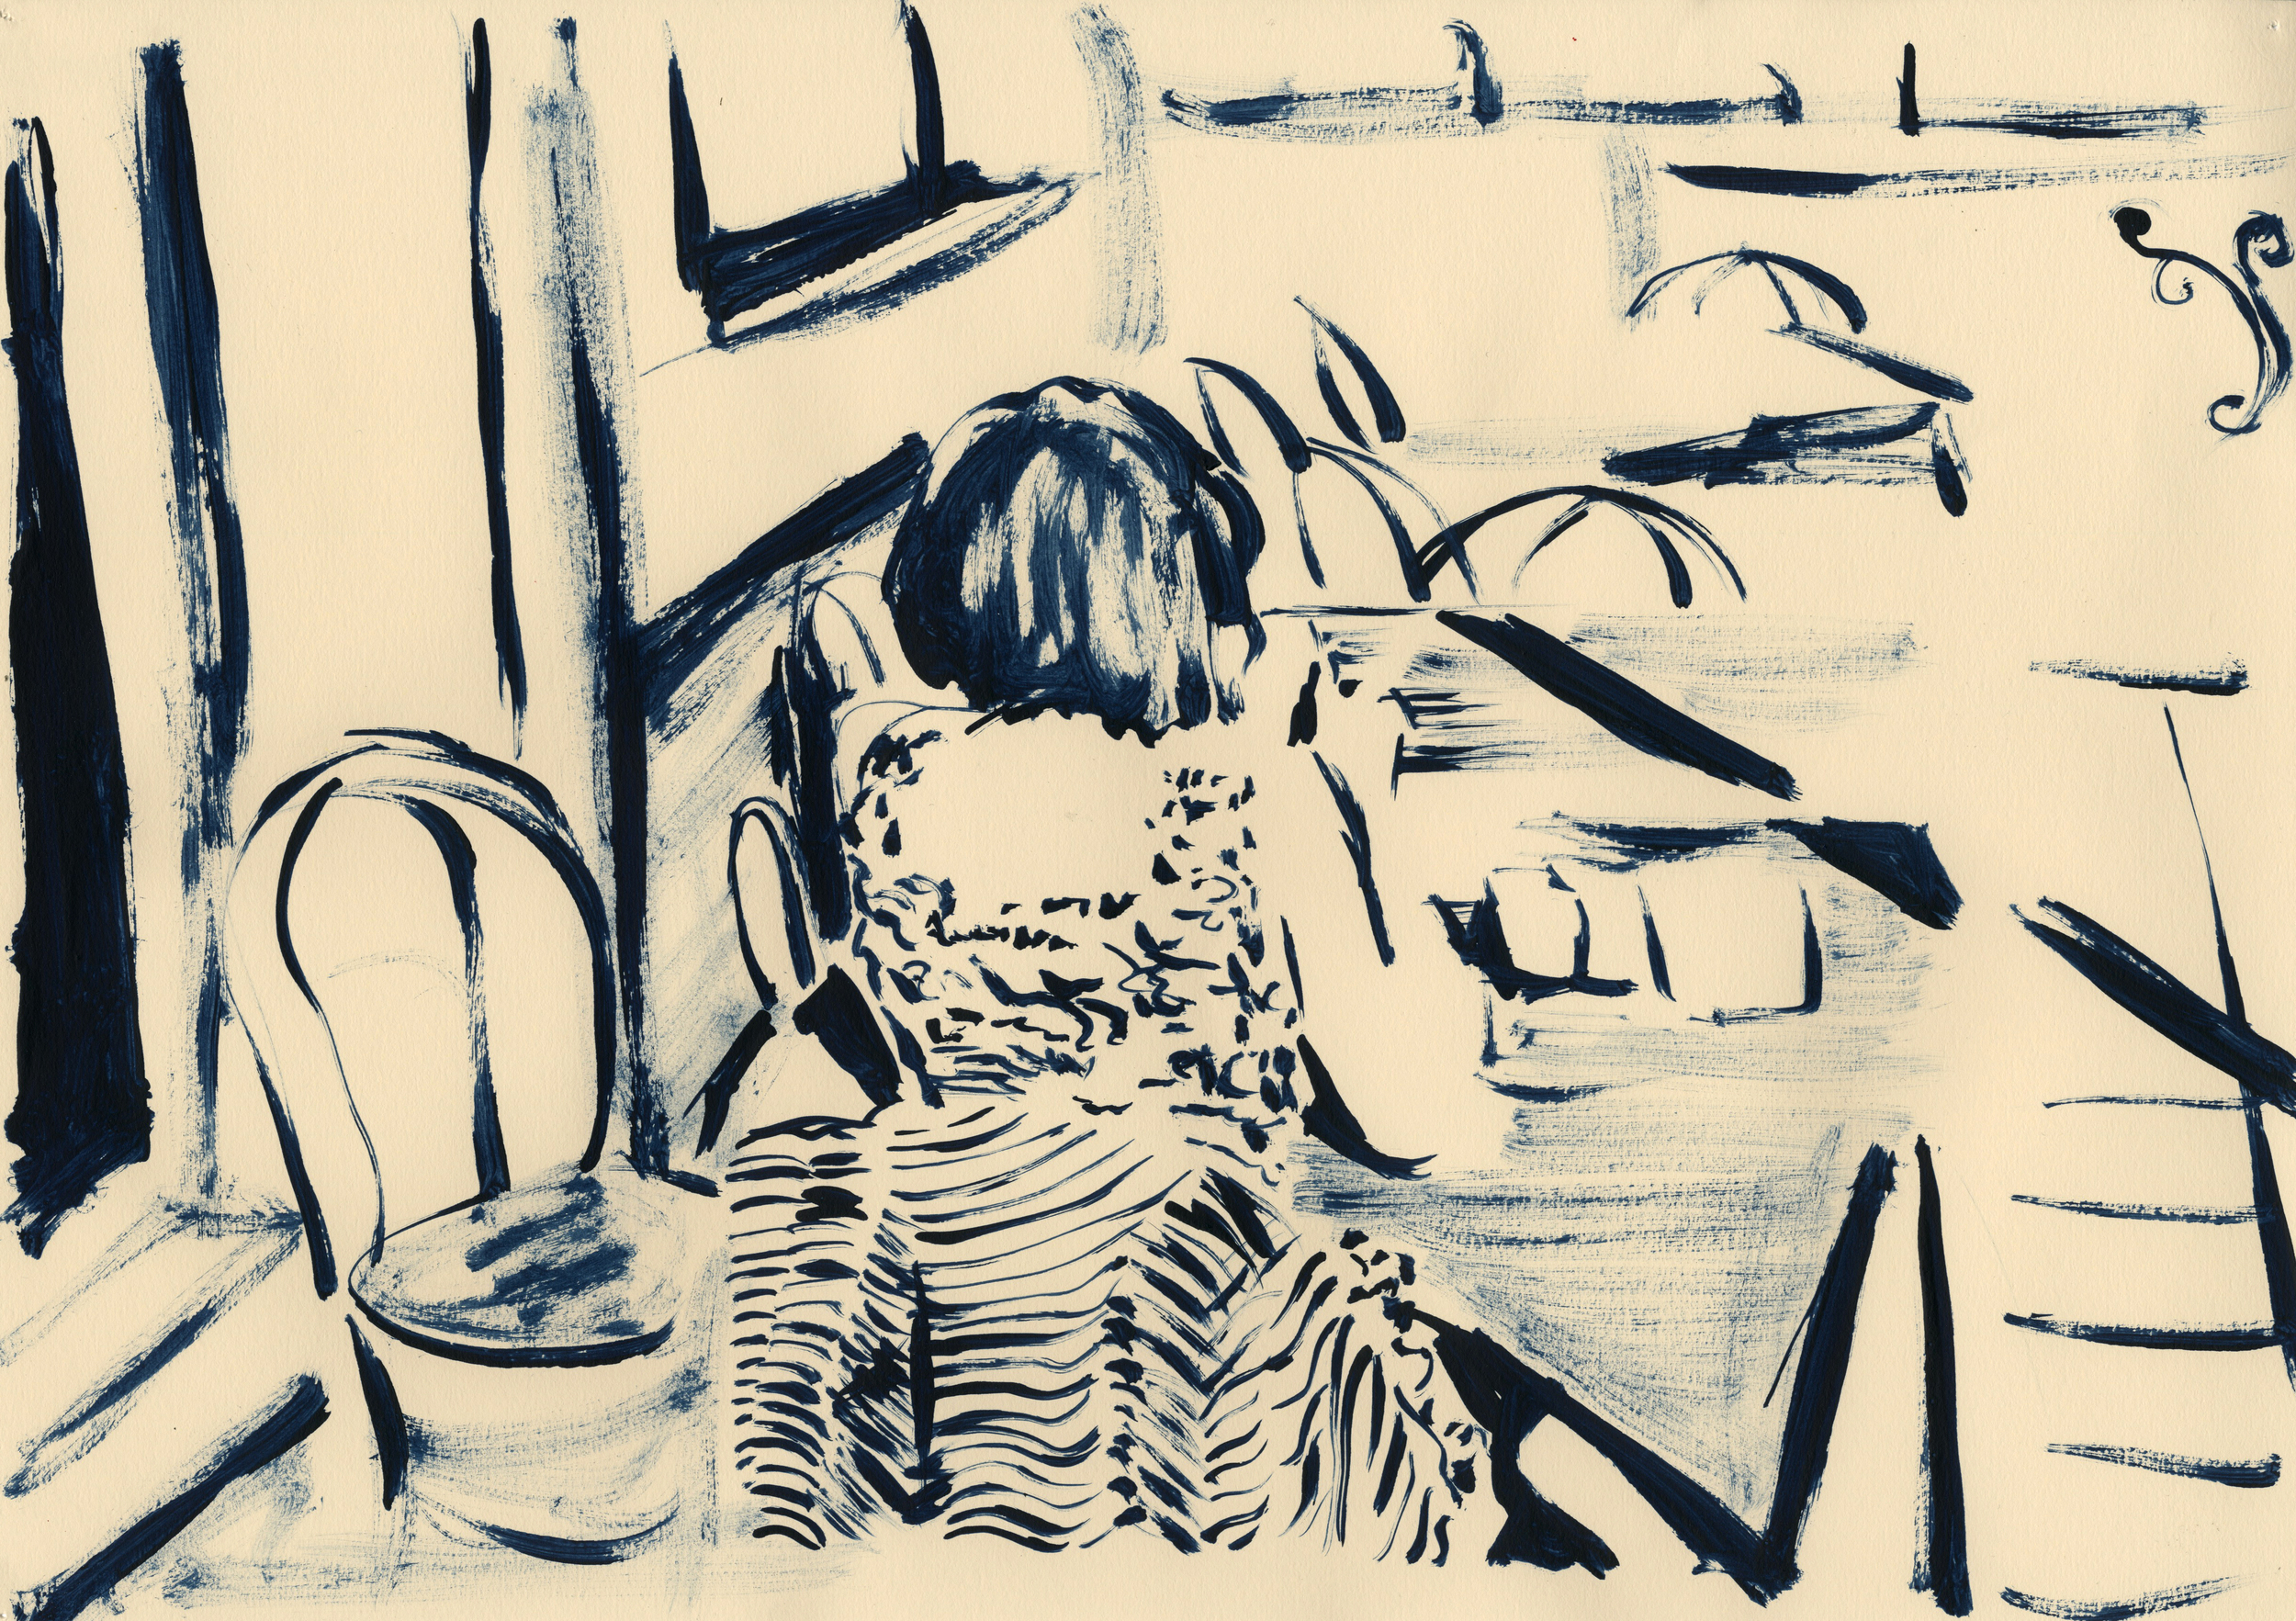 'Breakfast with Stefanie', 2012, ink on off-white cartridge paper, 29.5 x 42 cm